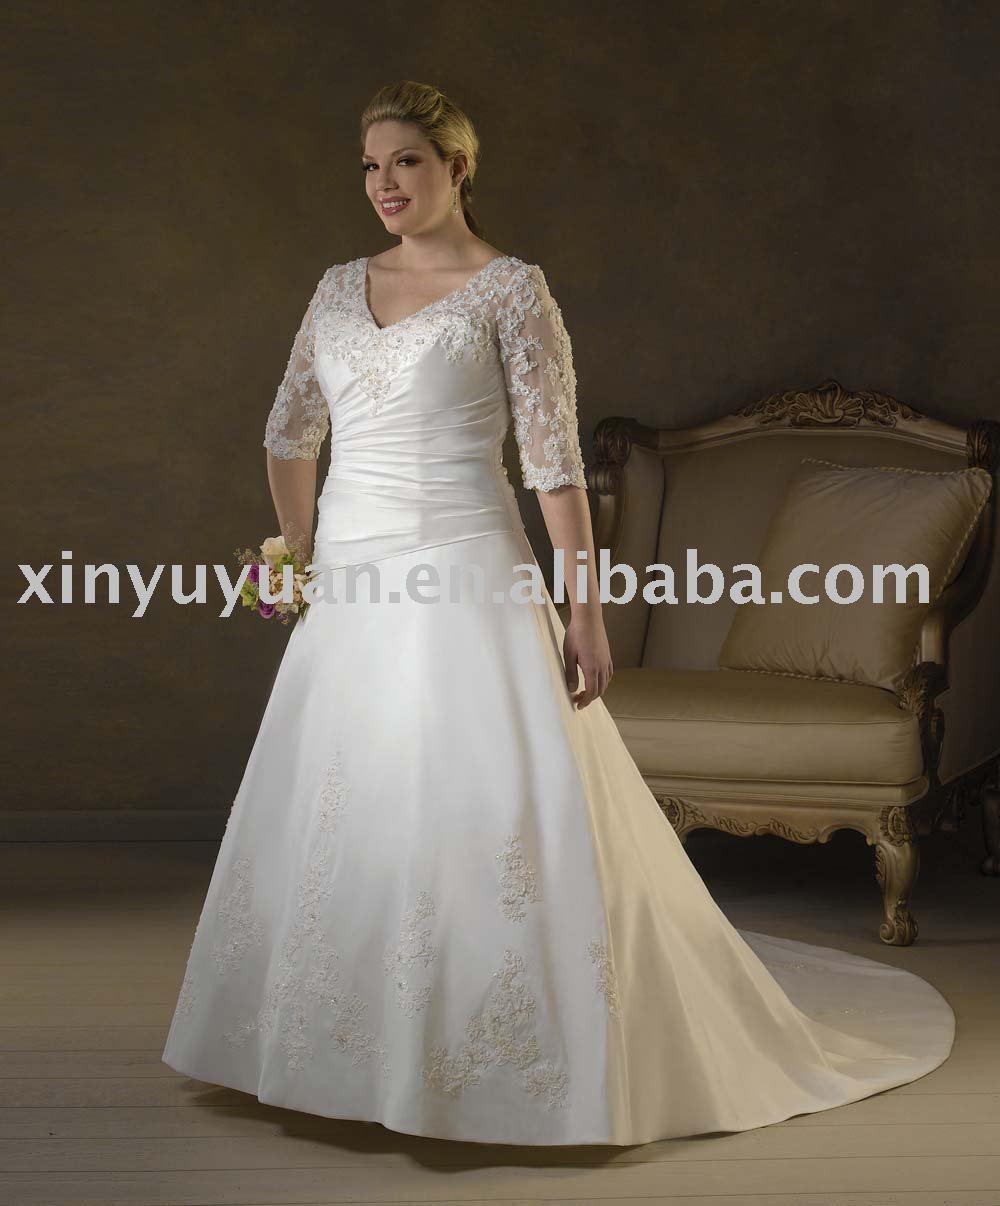 plus size modest wedding dresses cheap modest wedding dresses cheap Plus Size Modest Wedding Dresses Cheap